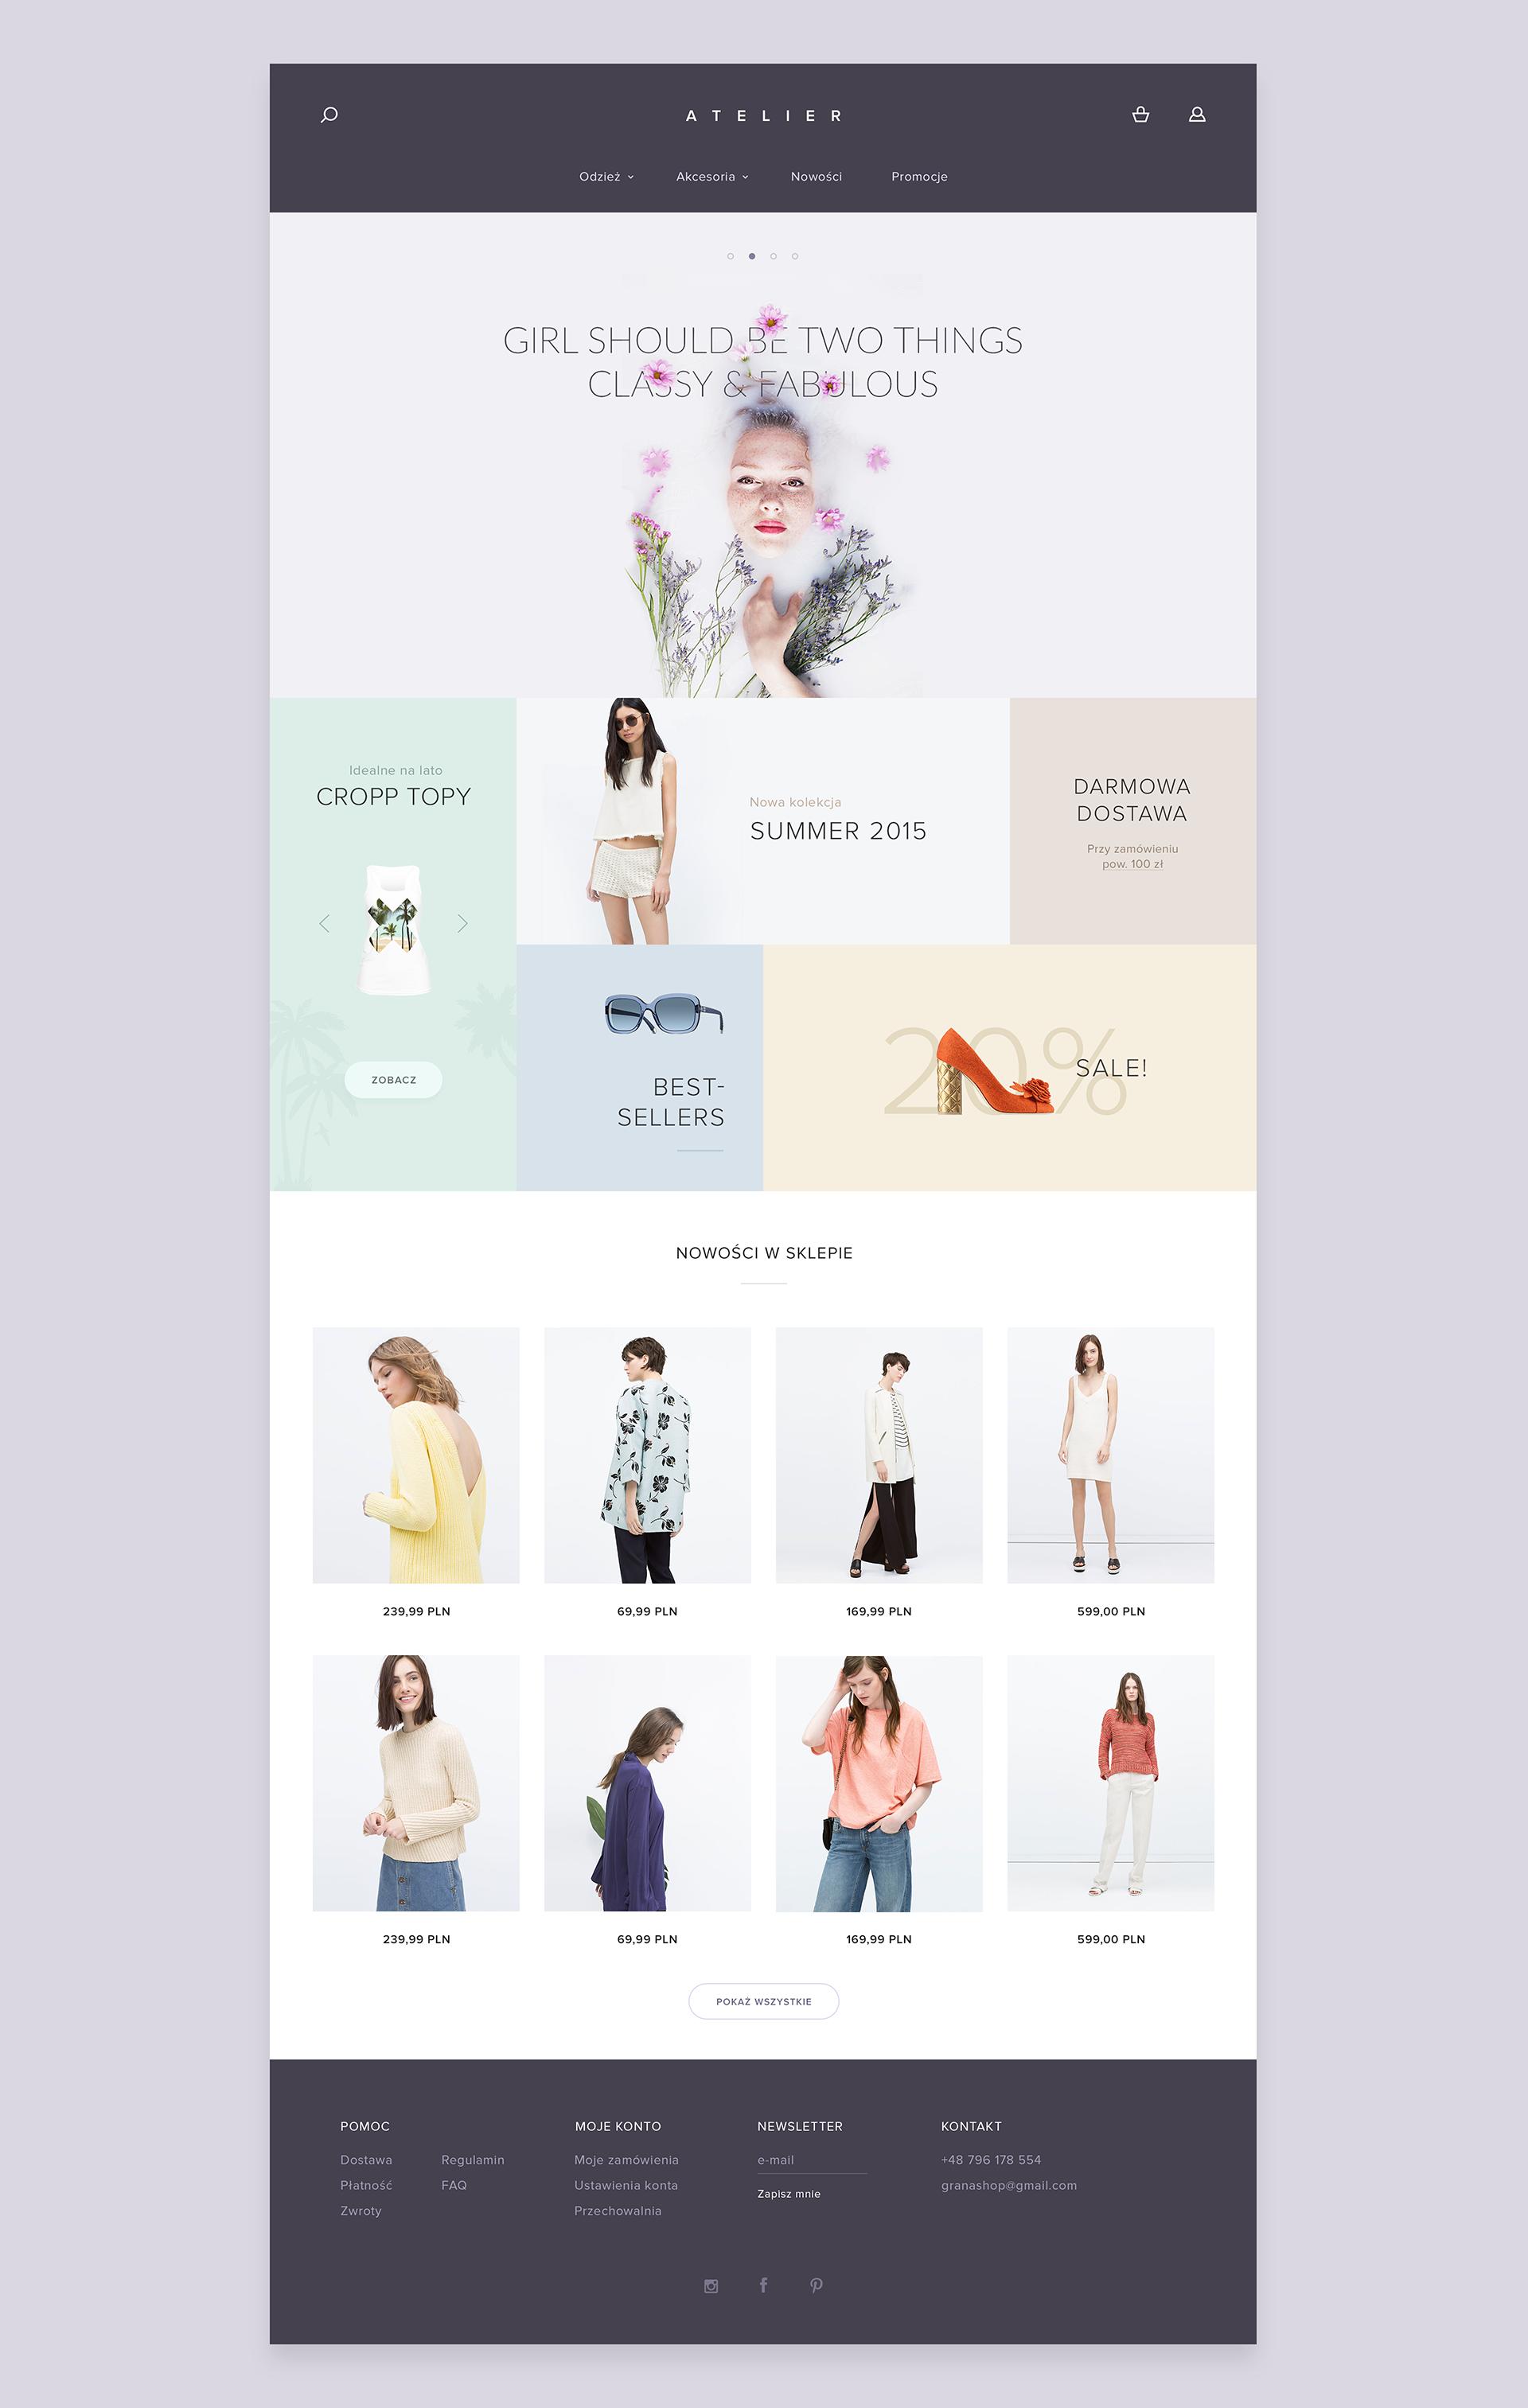 Granashop Png By Michael Korwin Ecommerce Web Design Web Layout Design Ecommerce Design